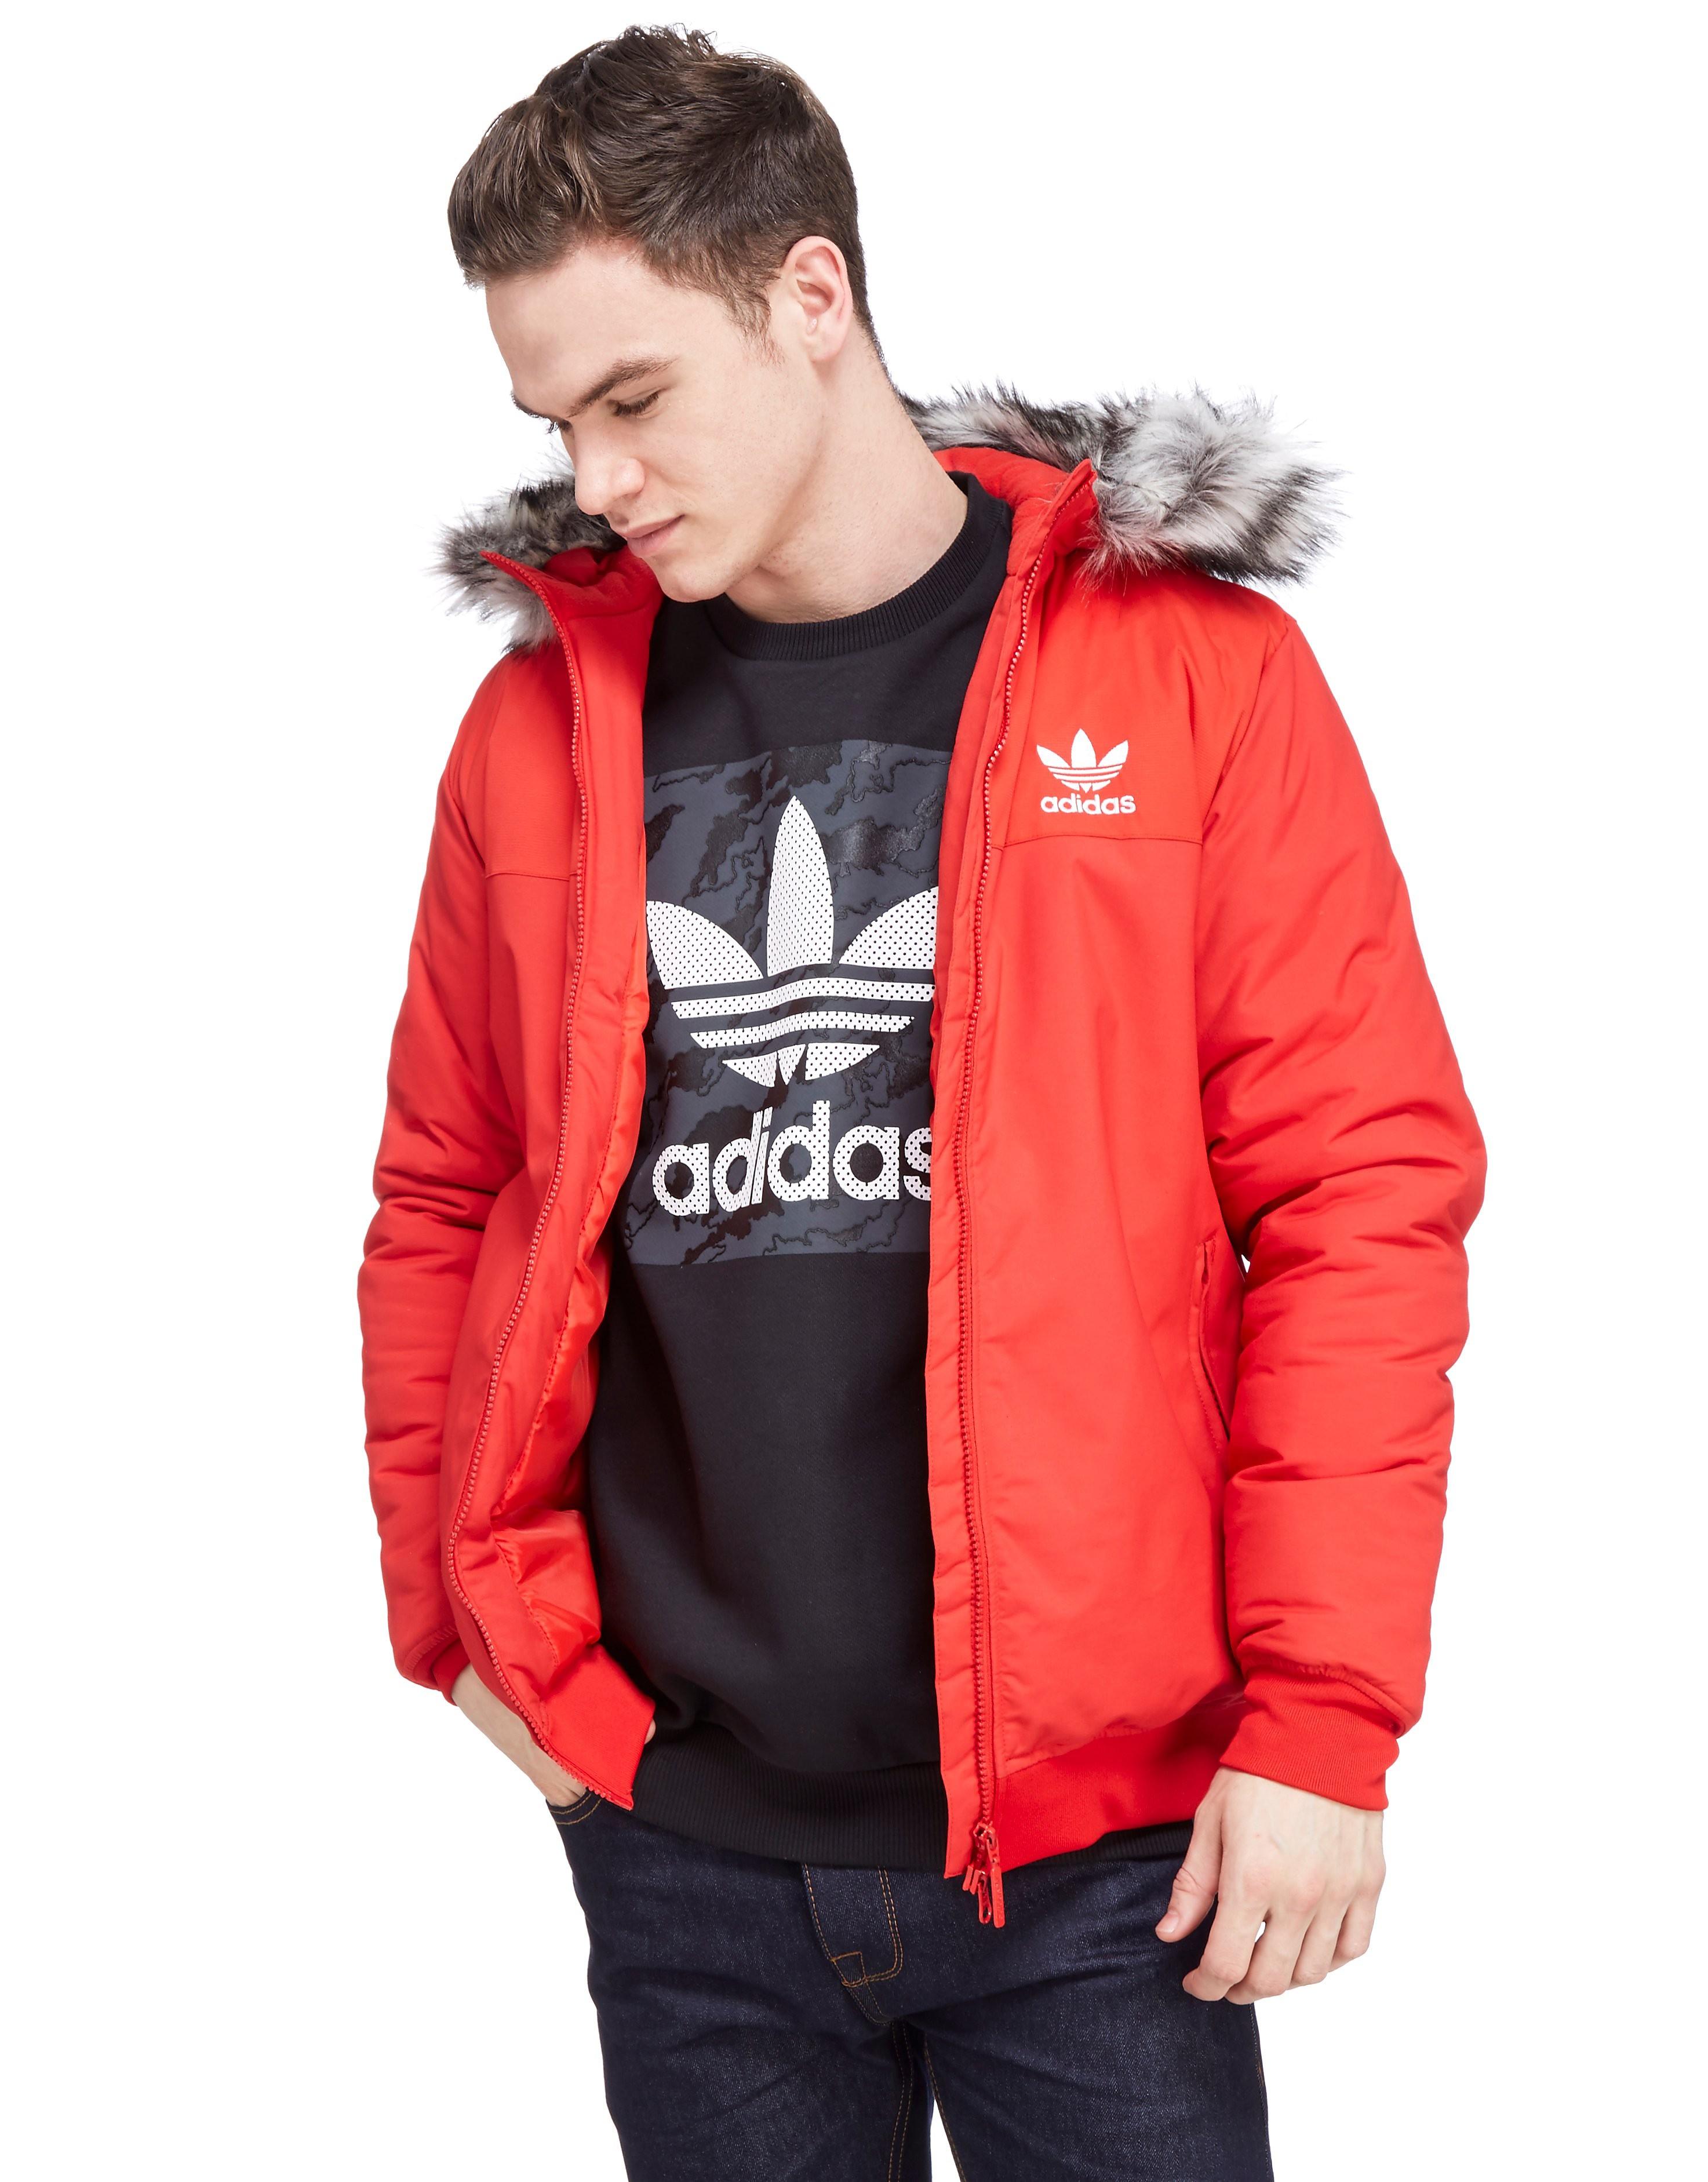 adidas Originals Trefoil Fur Jacket